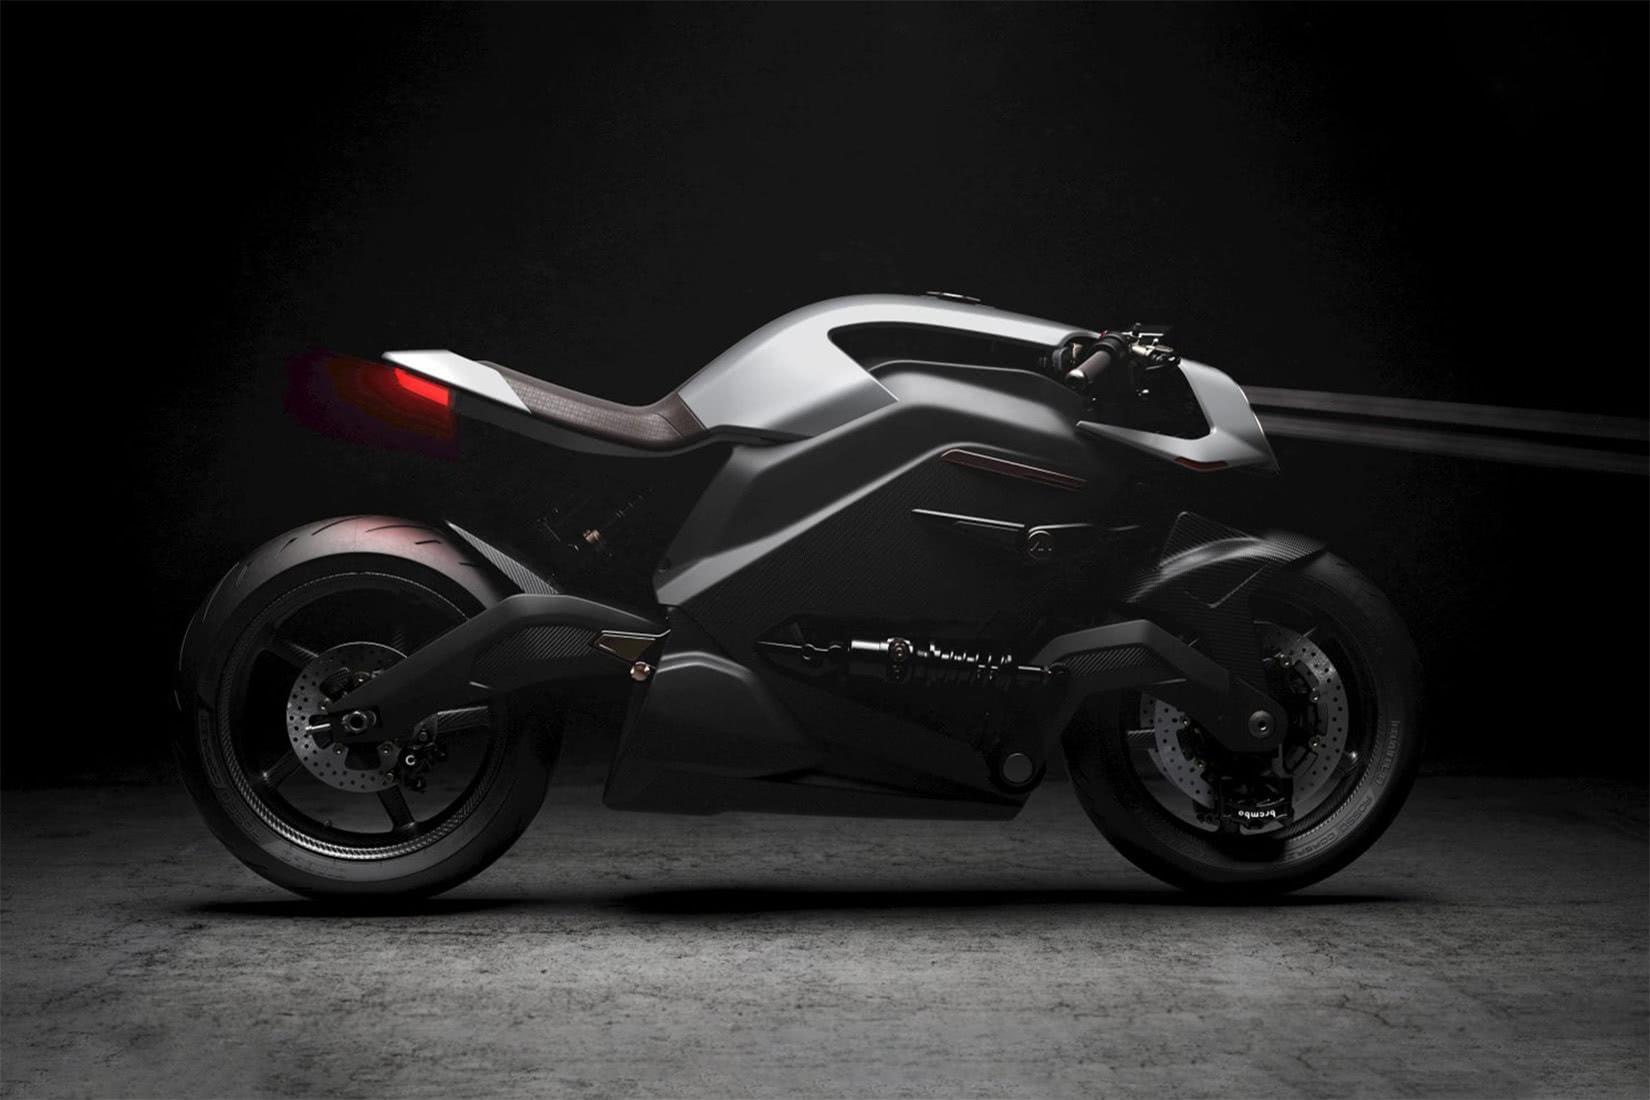 best electric motorcycles 2021 luxury Arc Vector - Luxe Digital